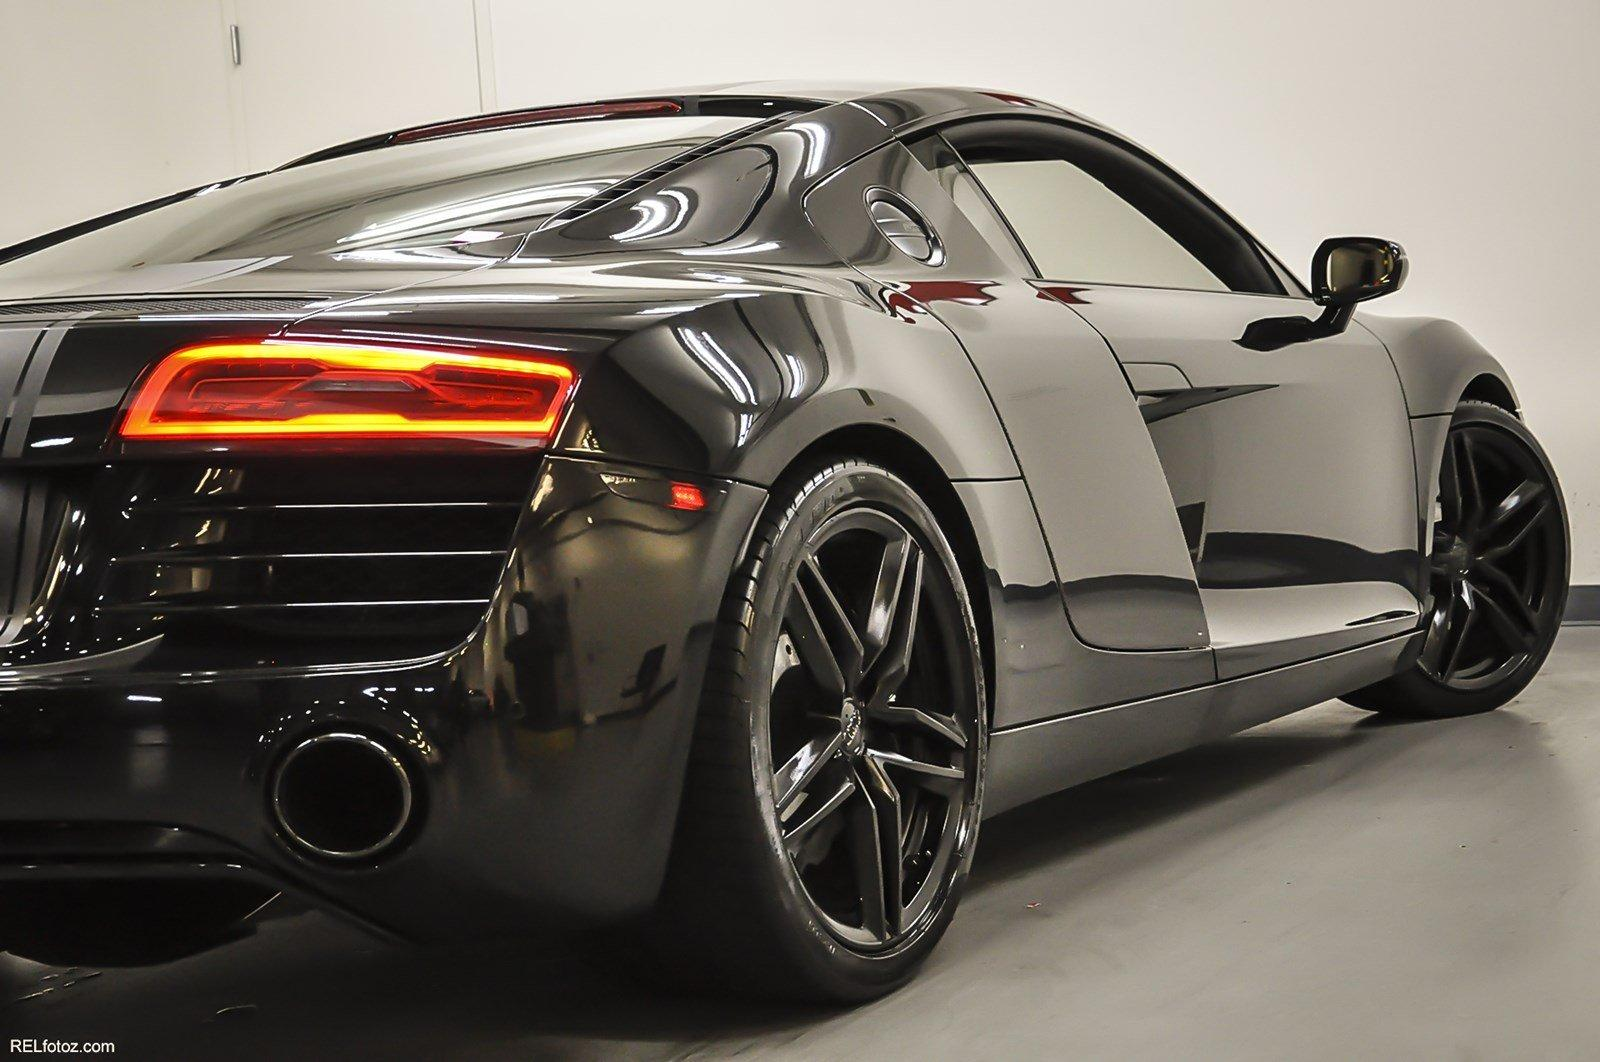 2014 Audi R8 V8 Stock 001223 For Sale Near Marietta Ga